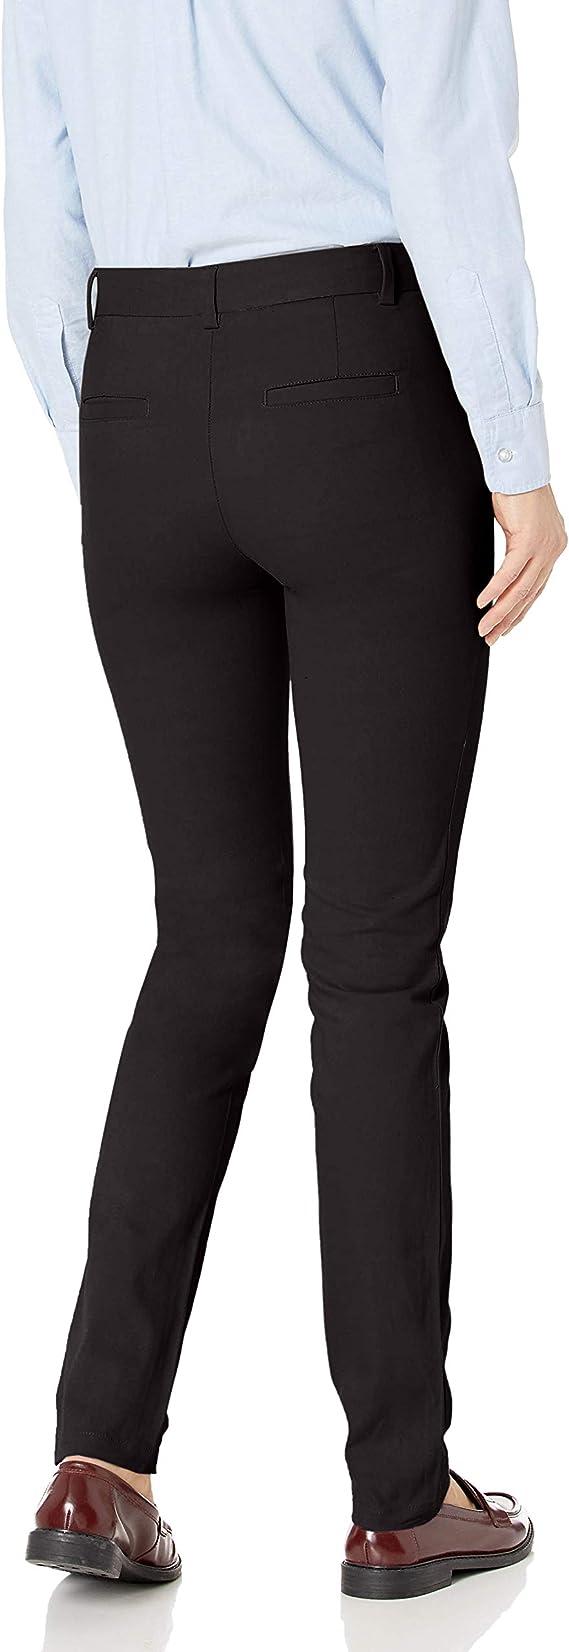 IZOD Juniors Uniform Skinny Stretch Sateen Pant